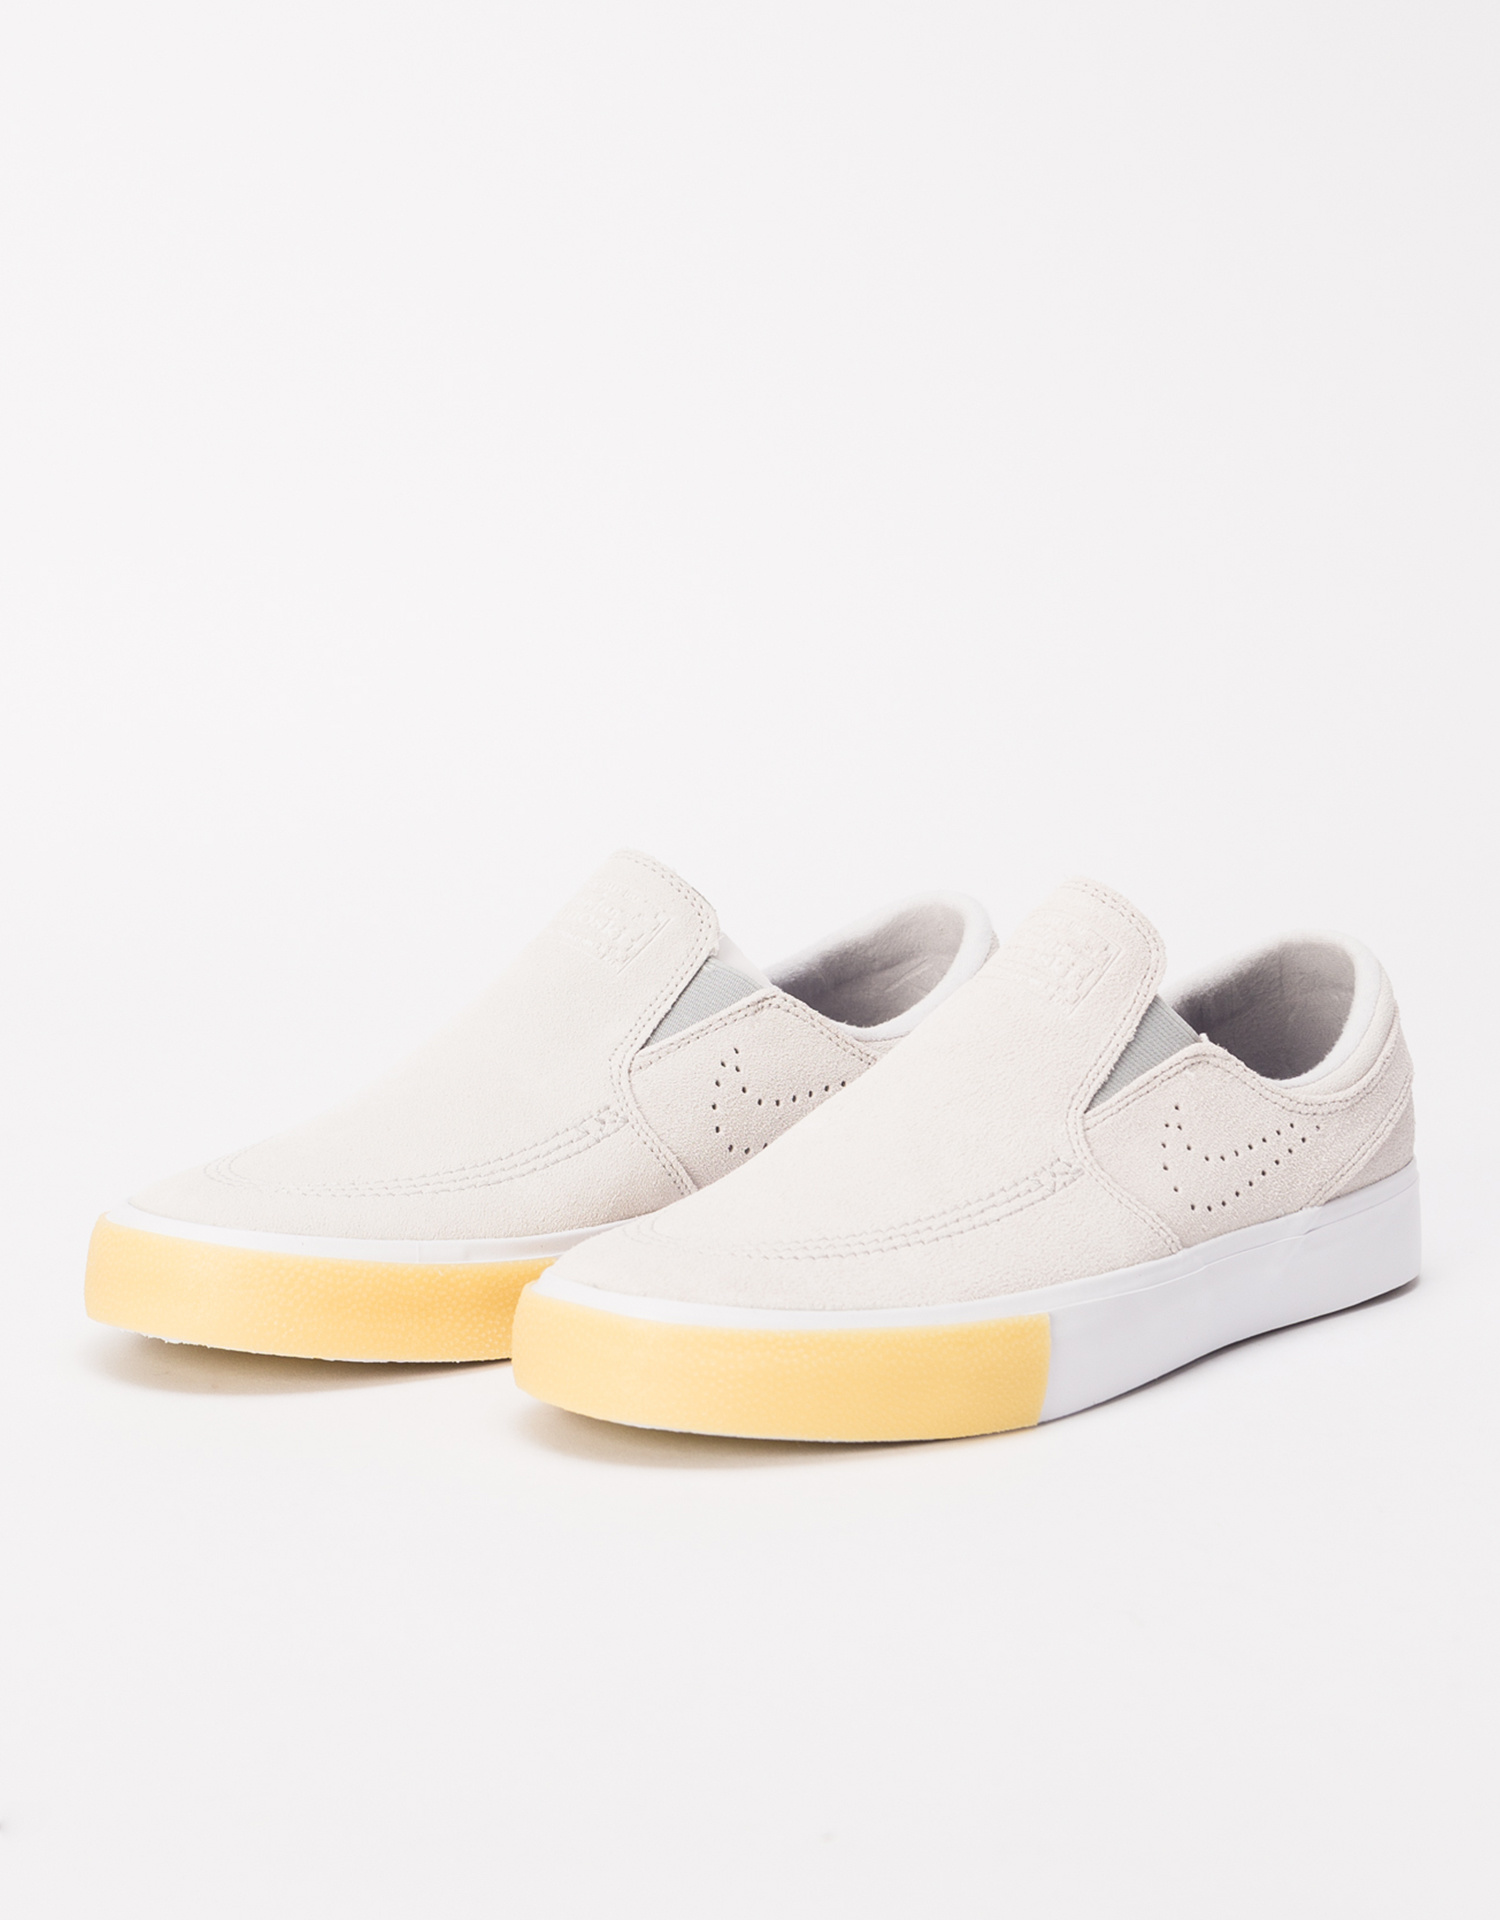 classic fit 8281b e7767 Nike SB Zoom Janoski Slip RM SE white white-vast grey-gum yellow - Lockwood  Skateshop